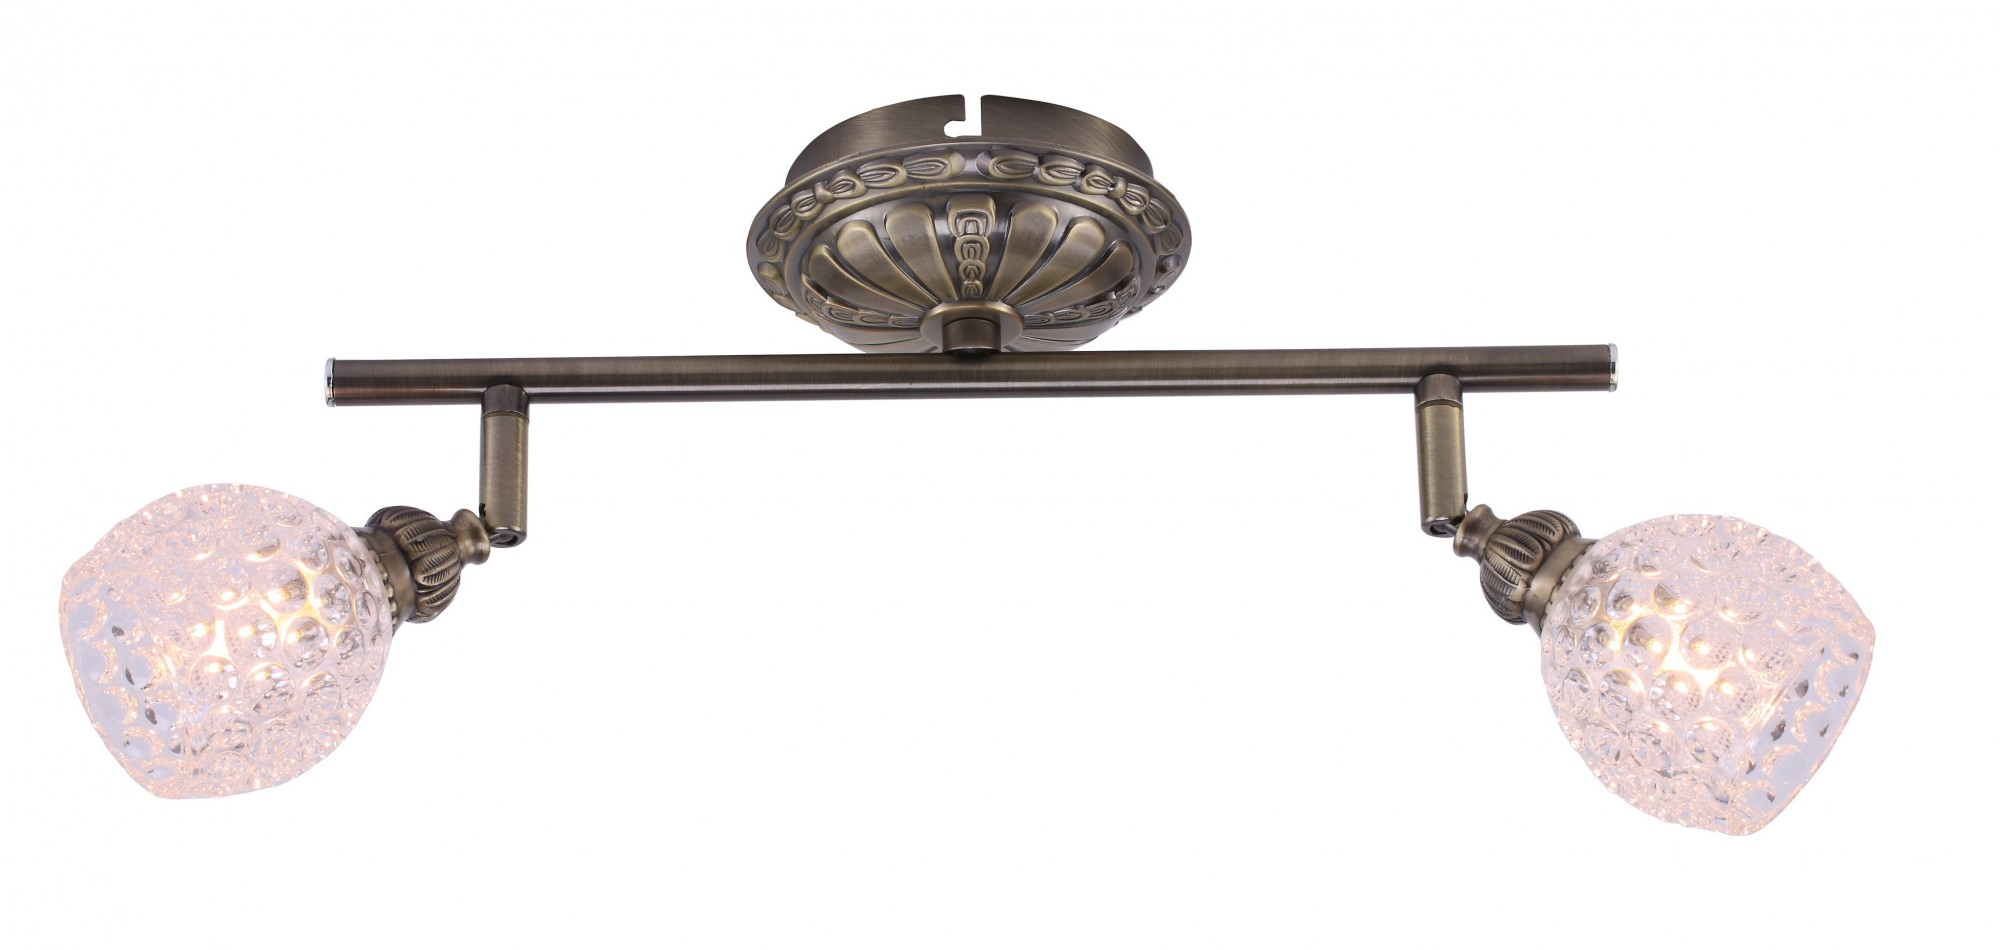 Спот Lamplandia L9013-2 alnus lamplandia 6026 10 rey